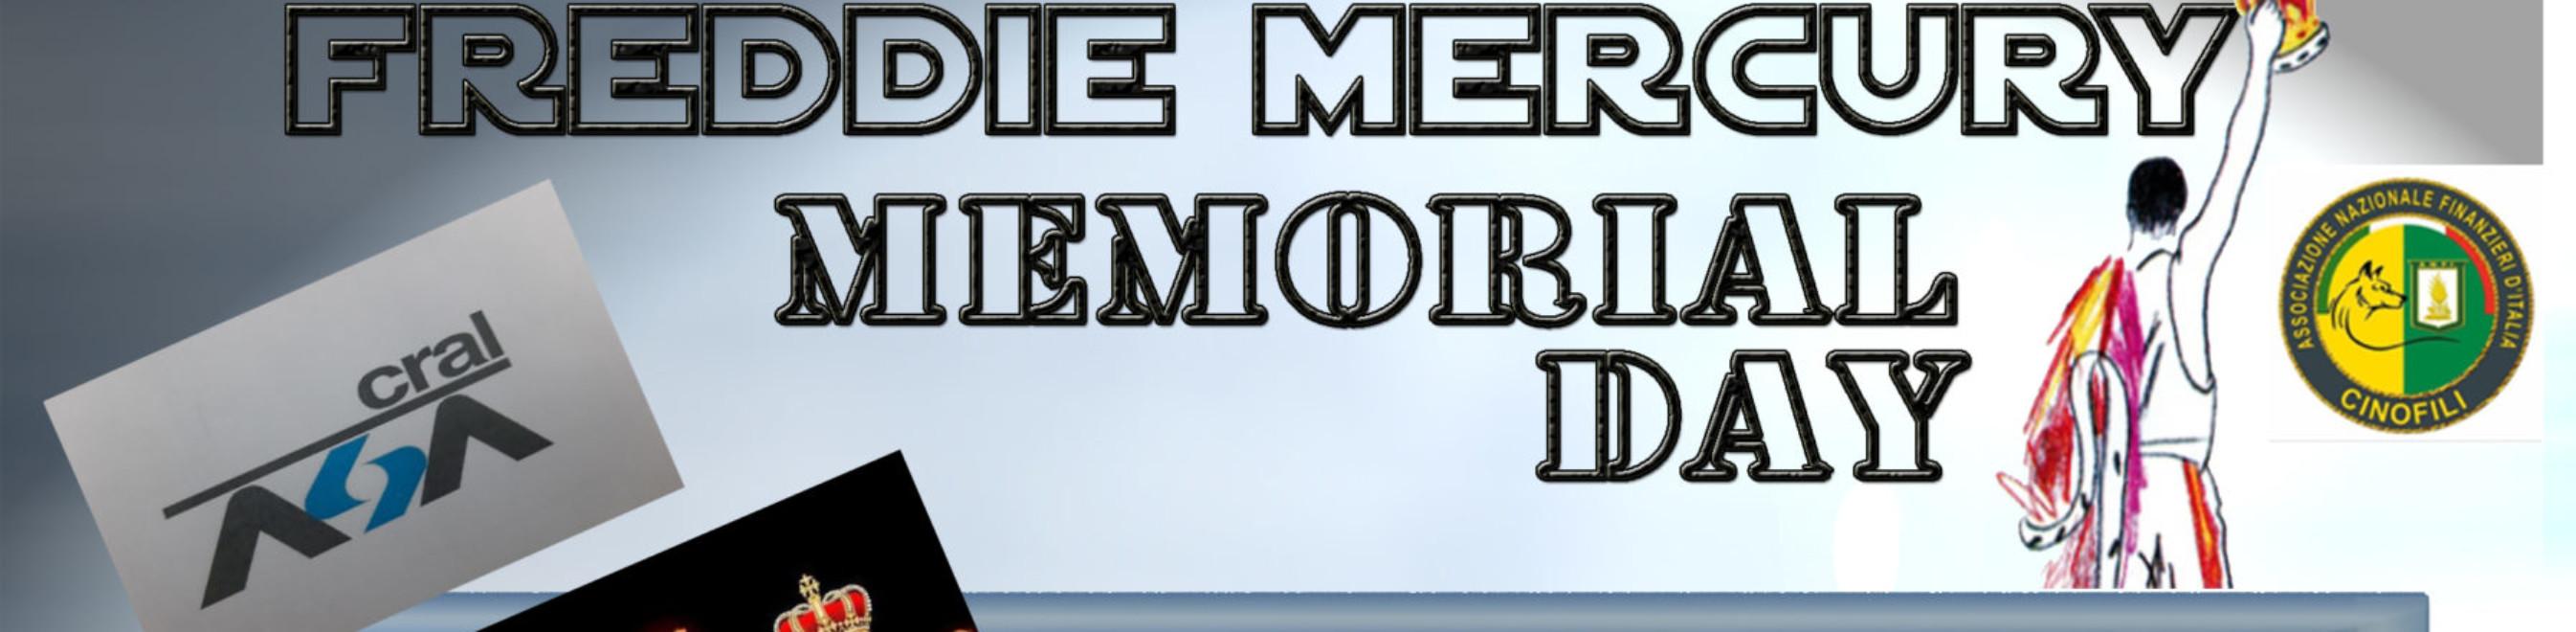 FREDDY MERCURY Memorial Day (Concessione)